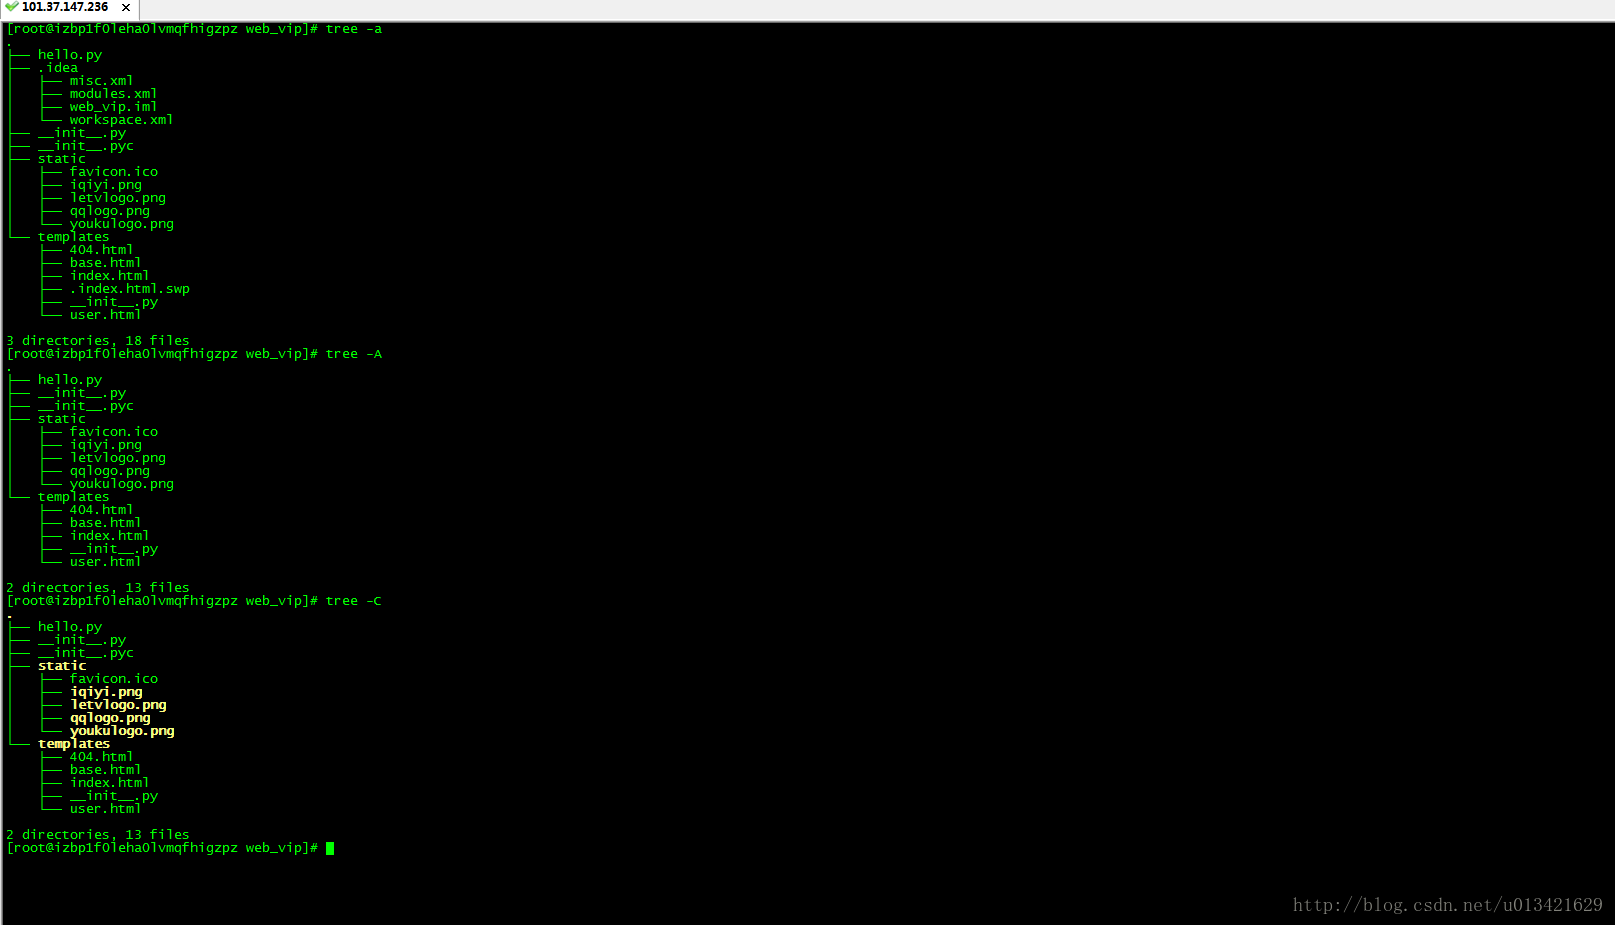 linux下tree命令的用法解释